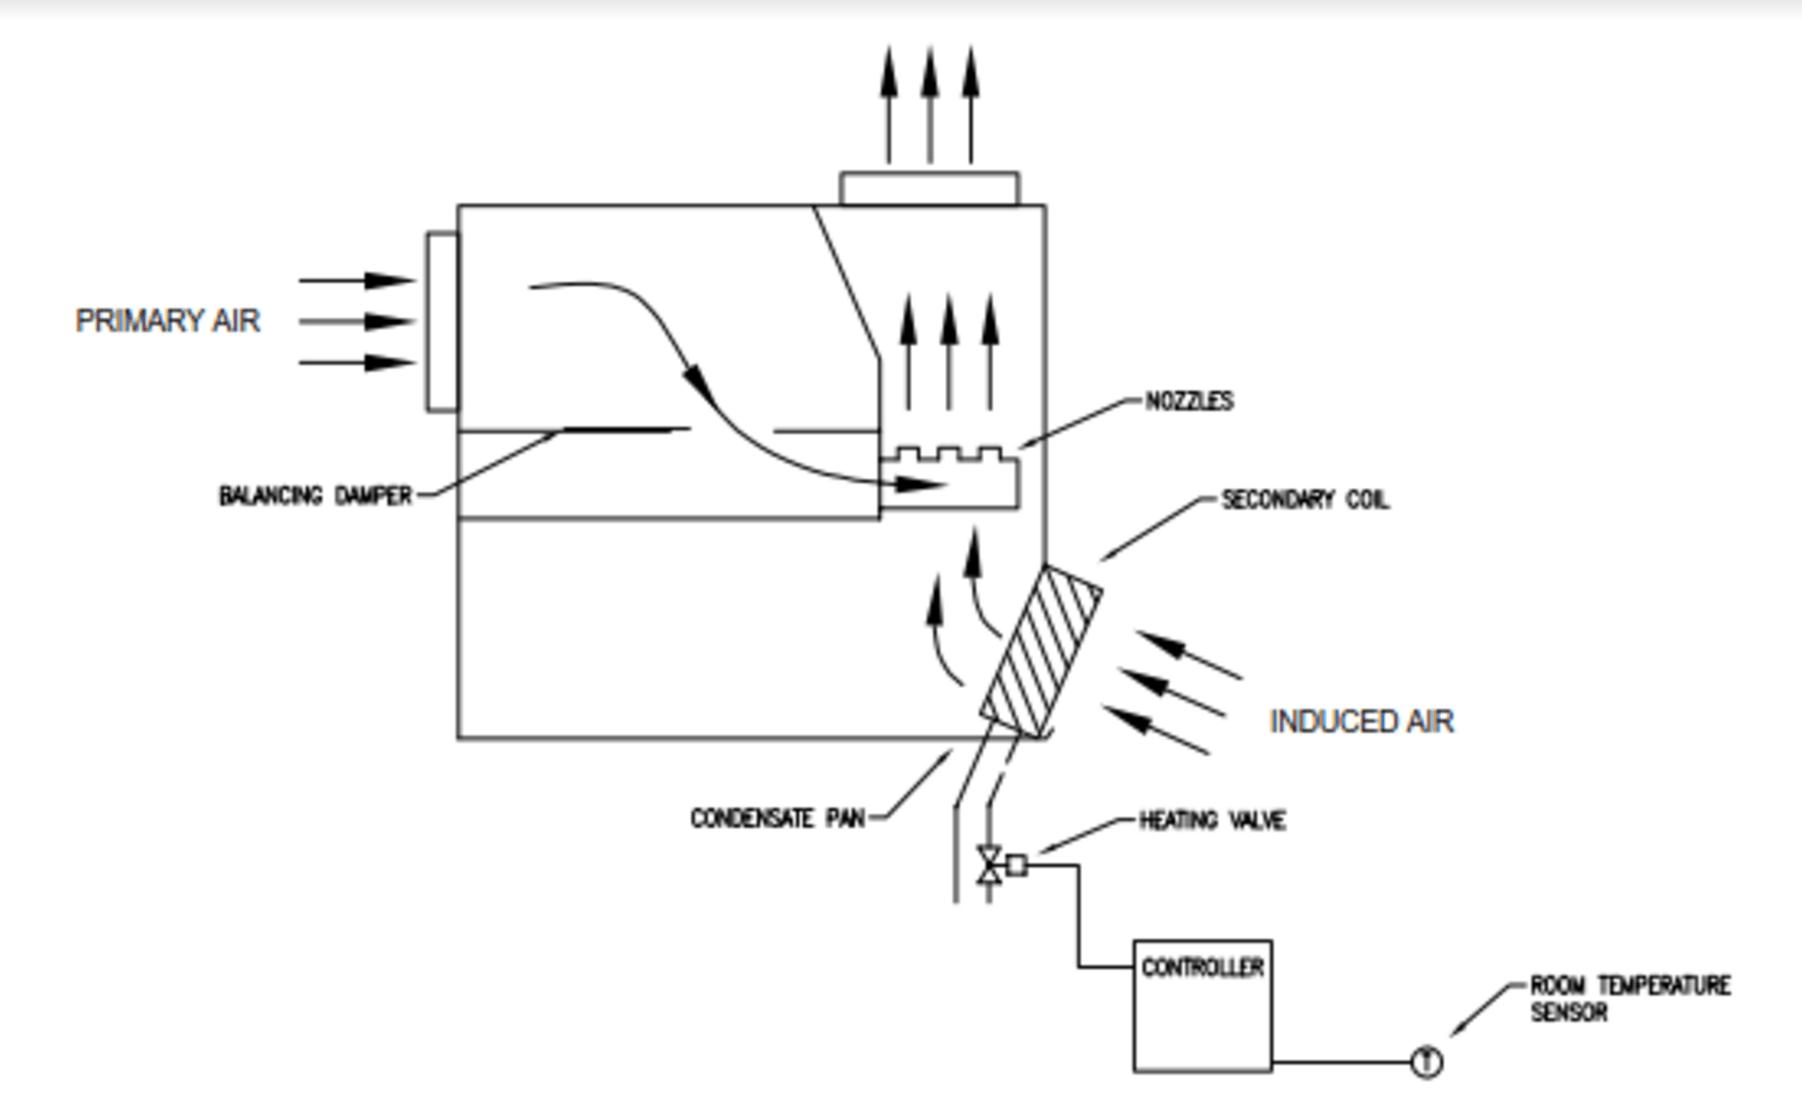 hight resolution of figure 3 perimeter induction terminal diagram